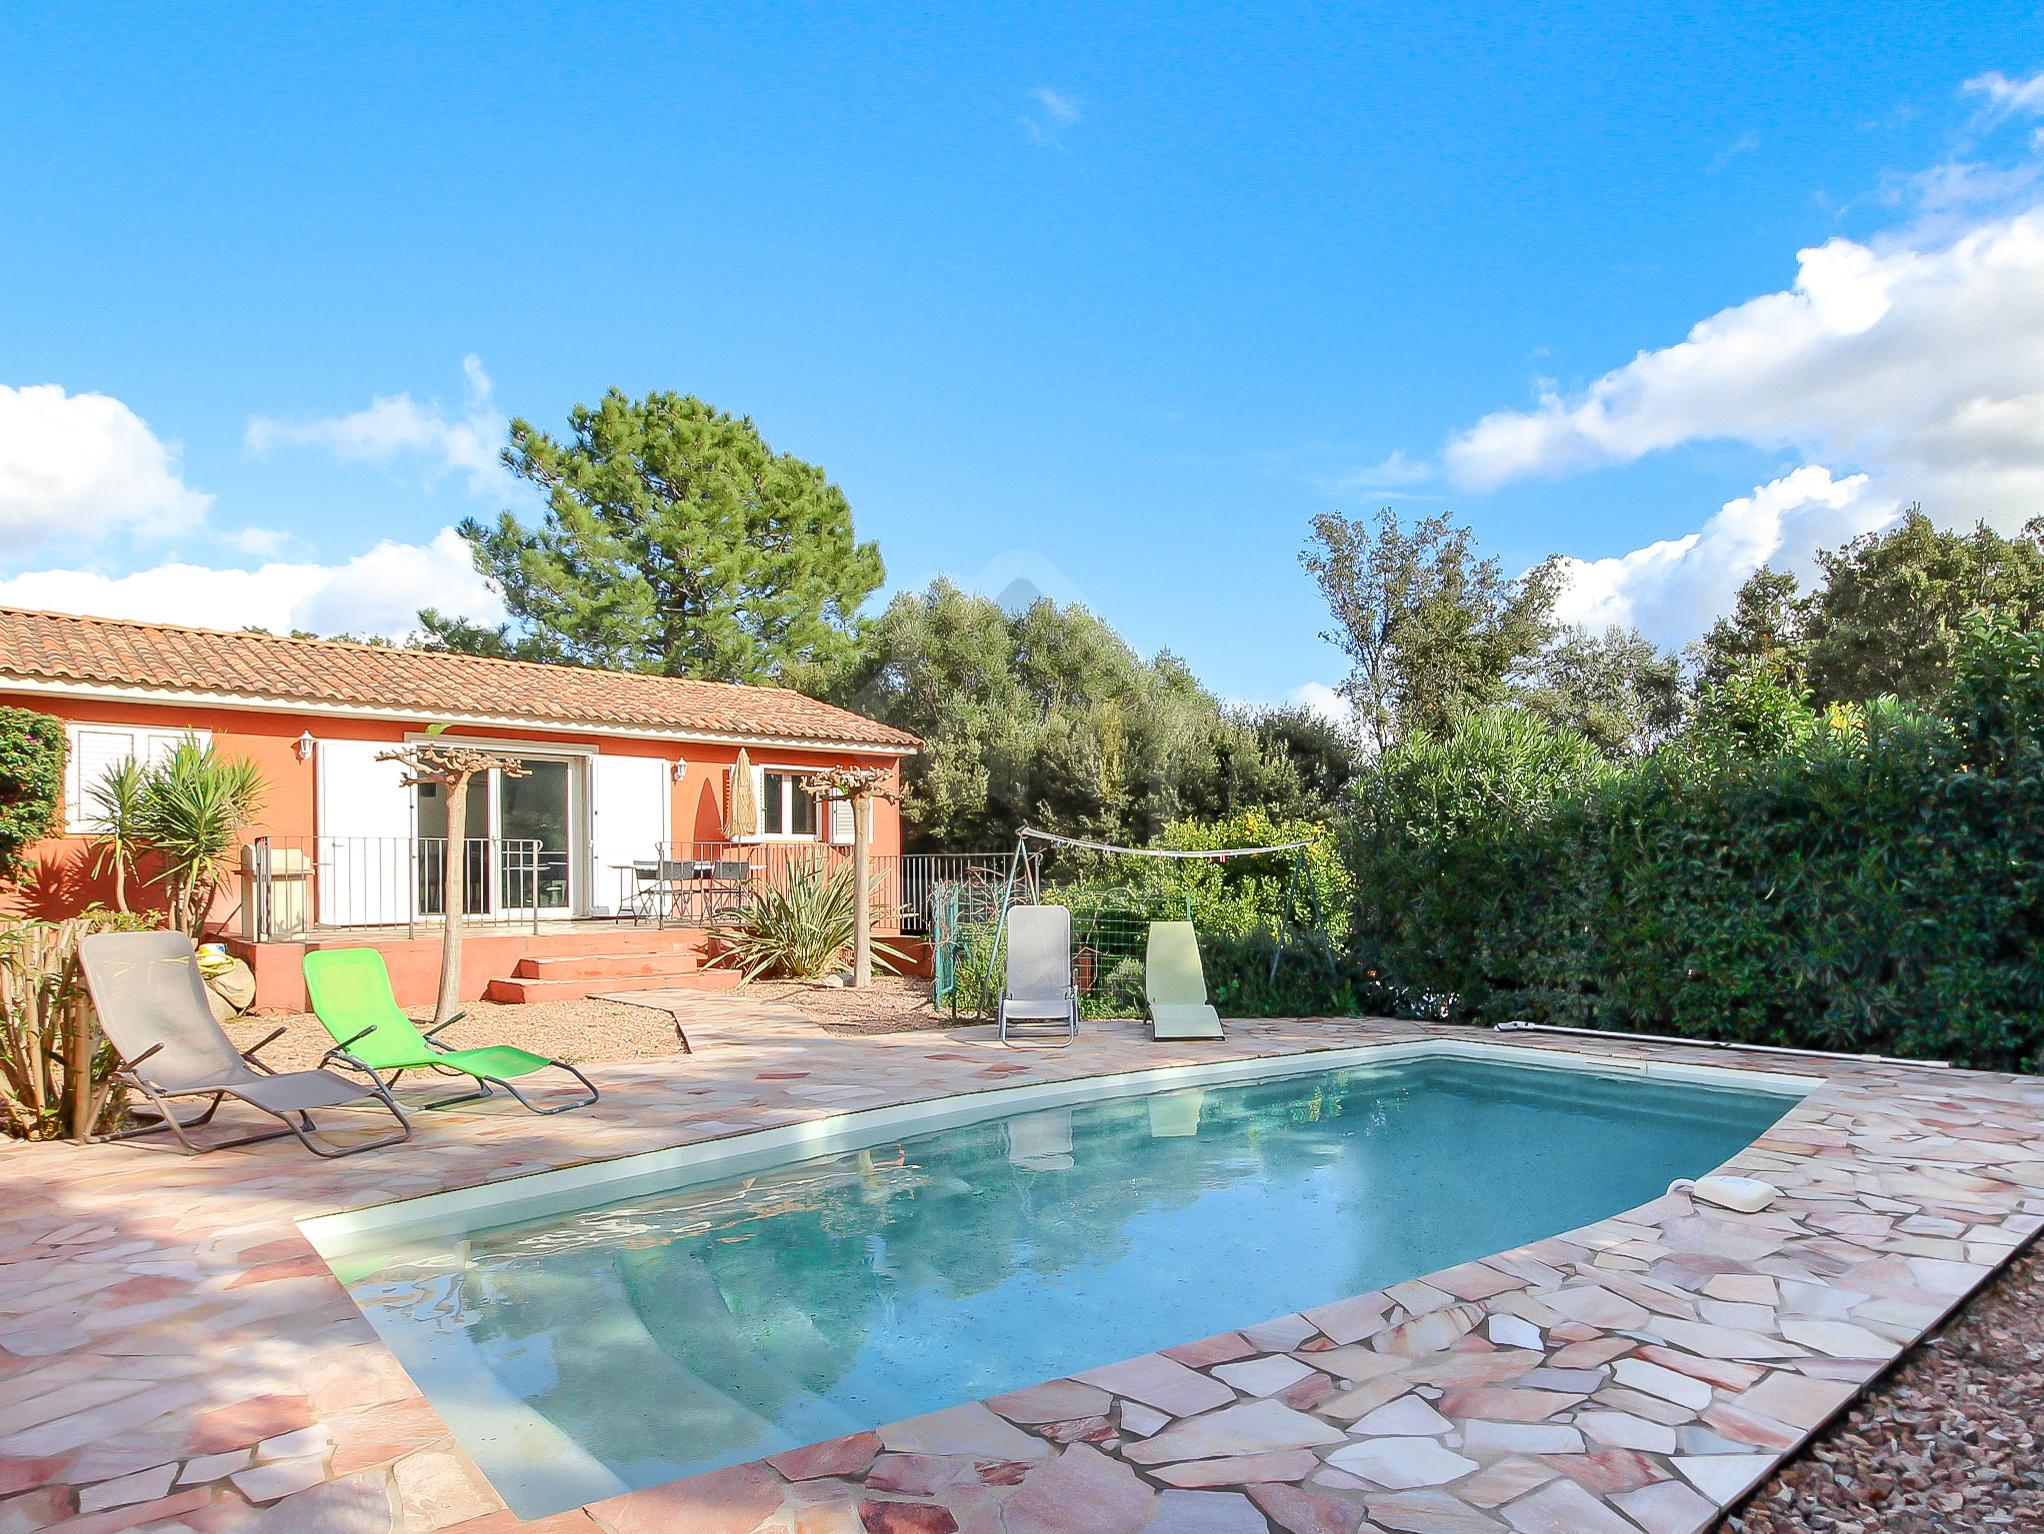 Vente Villa de Type T4 avec piscine